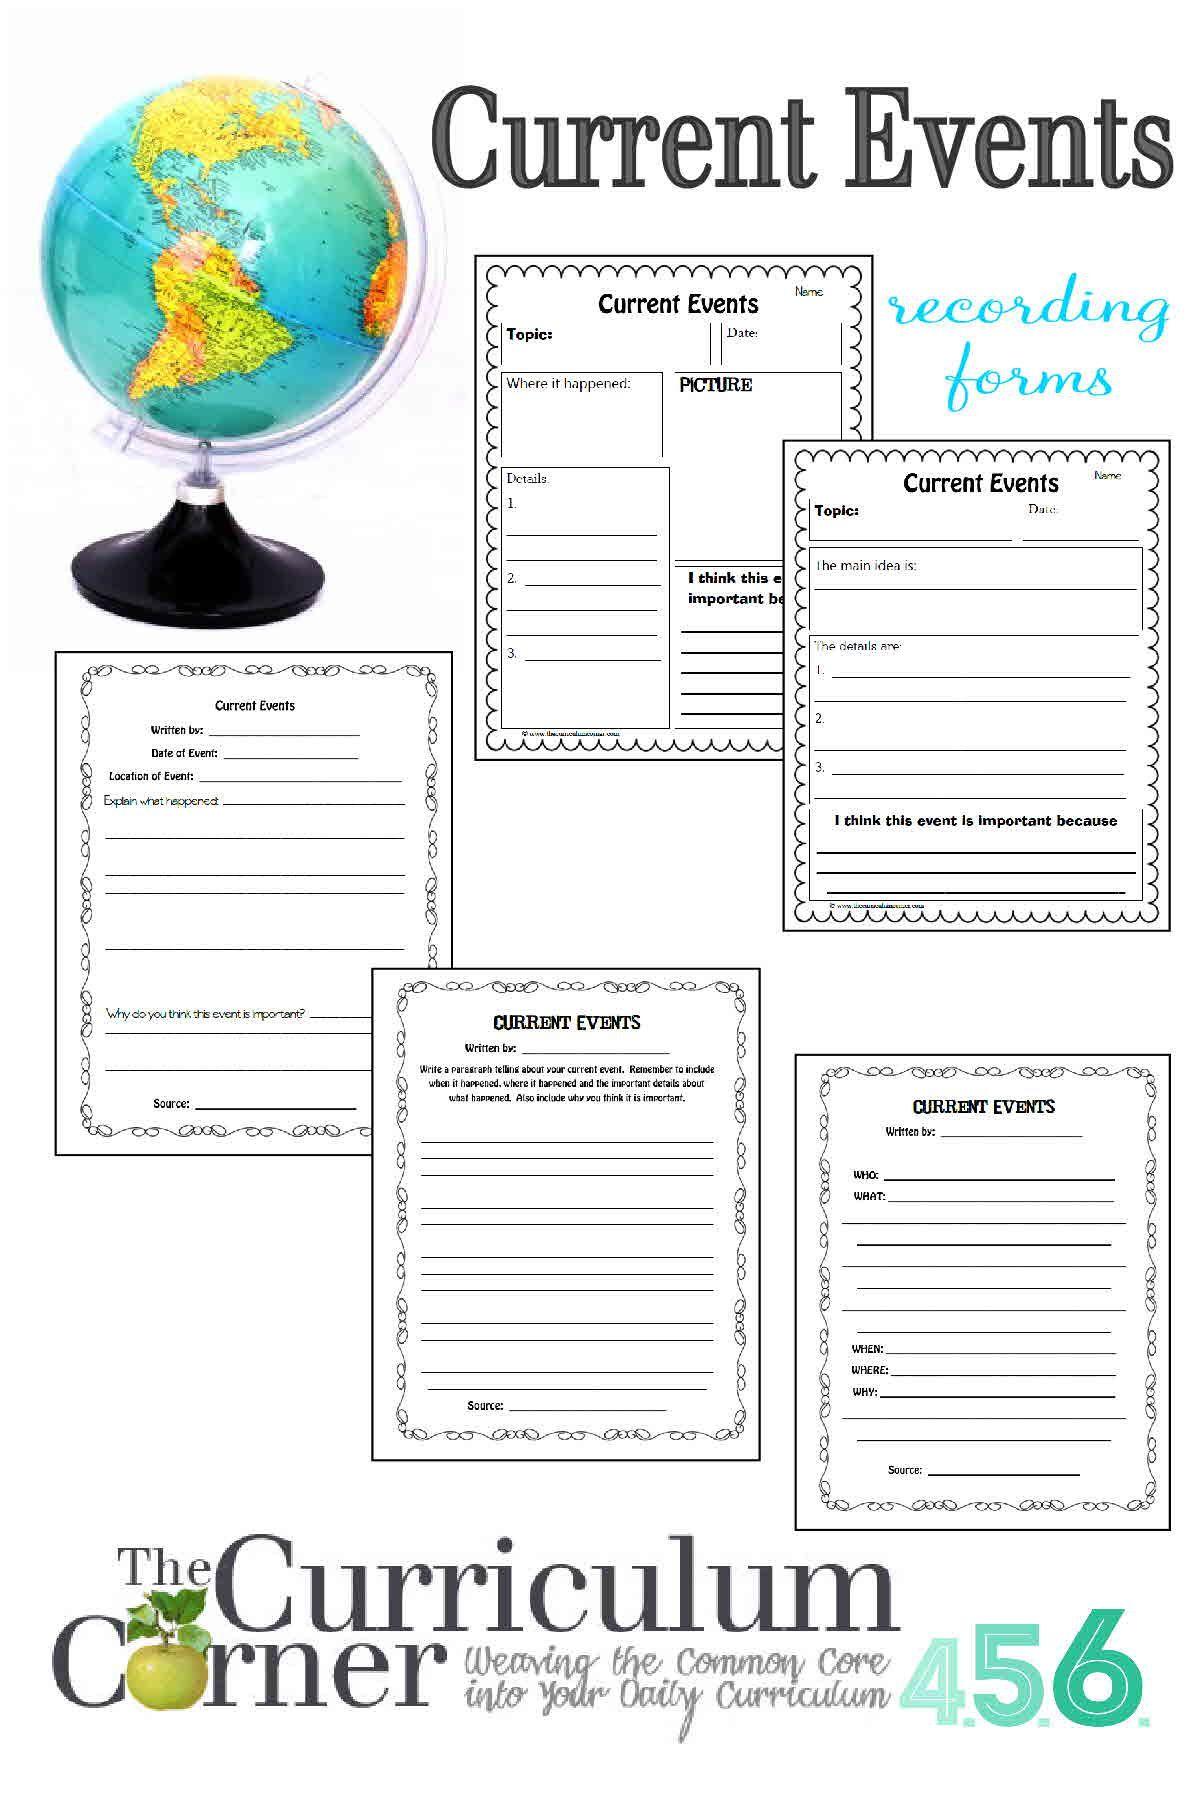 Current Events Teaching social studies, 6th grade social